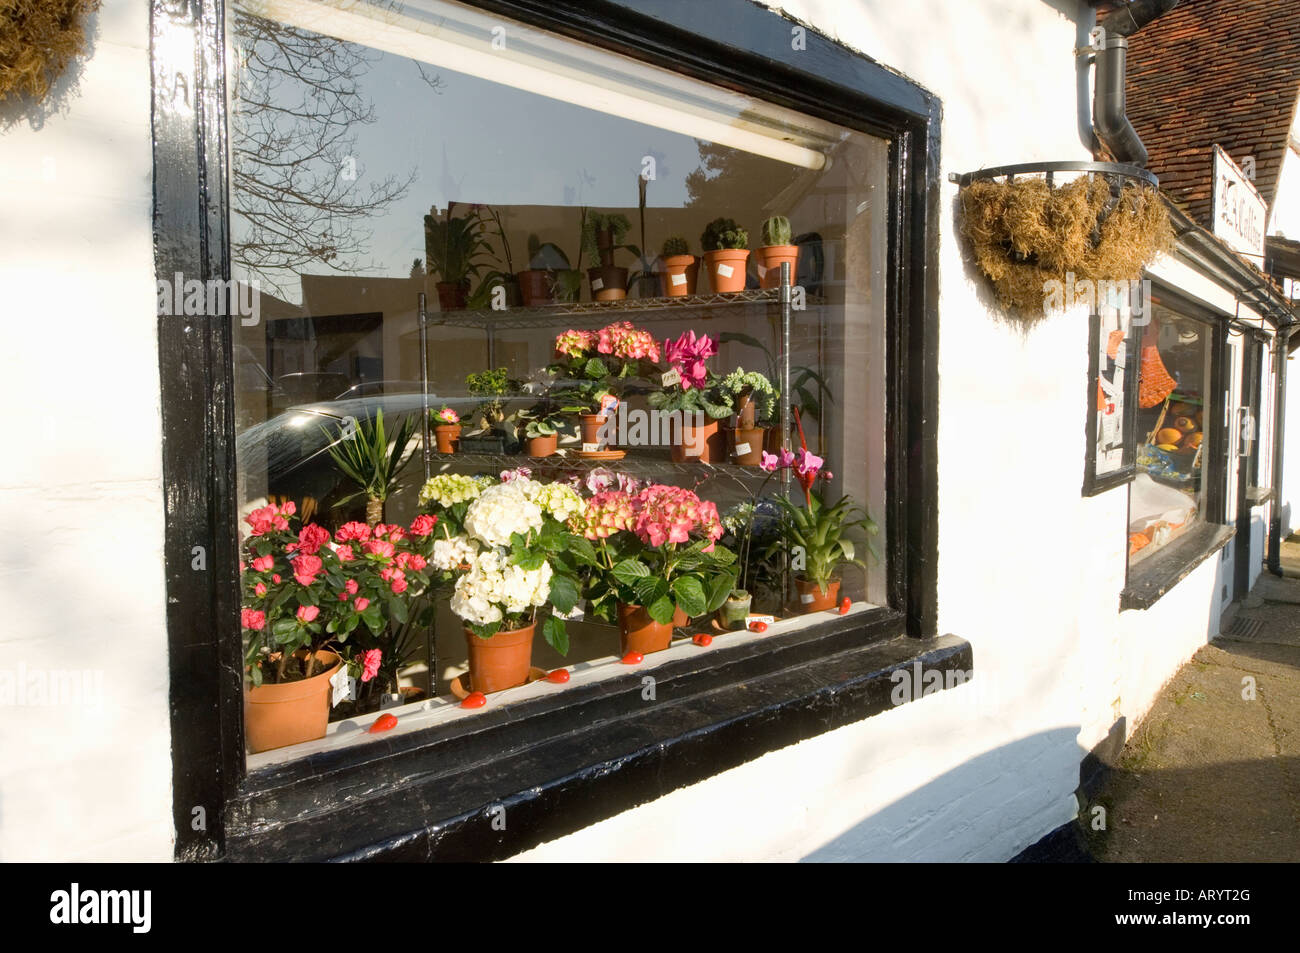 Flower Shop Shere Surrey England UK Stock Photo, Royalty Free ...